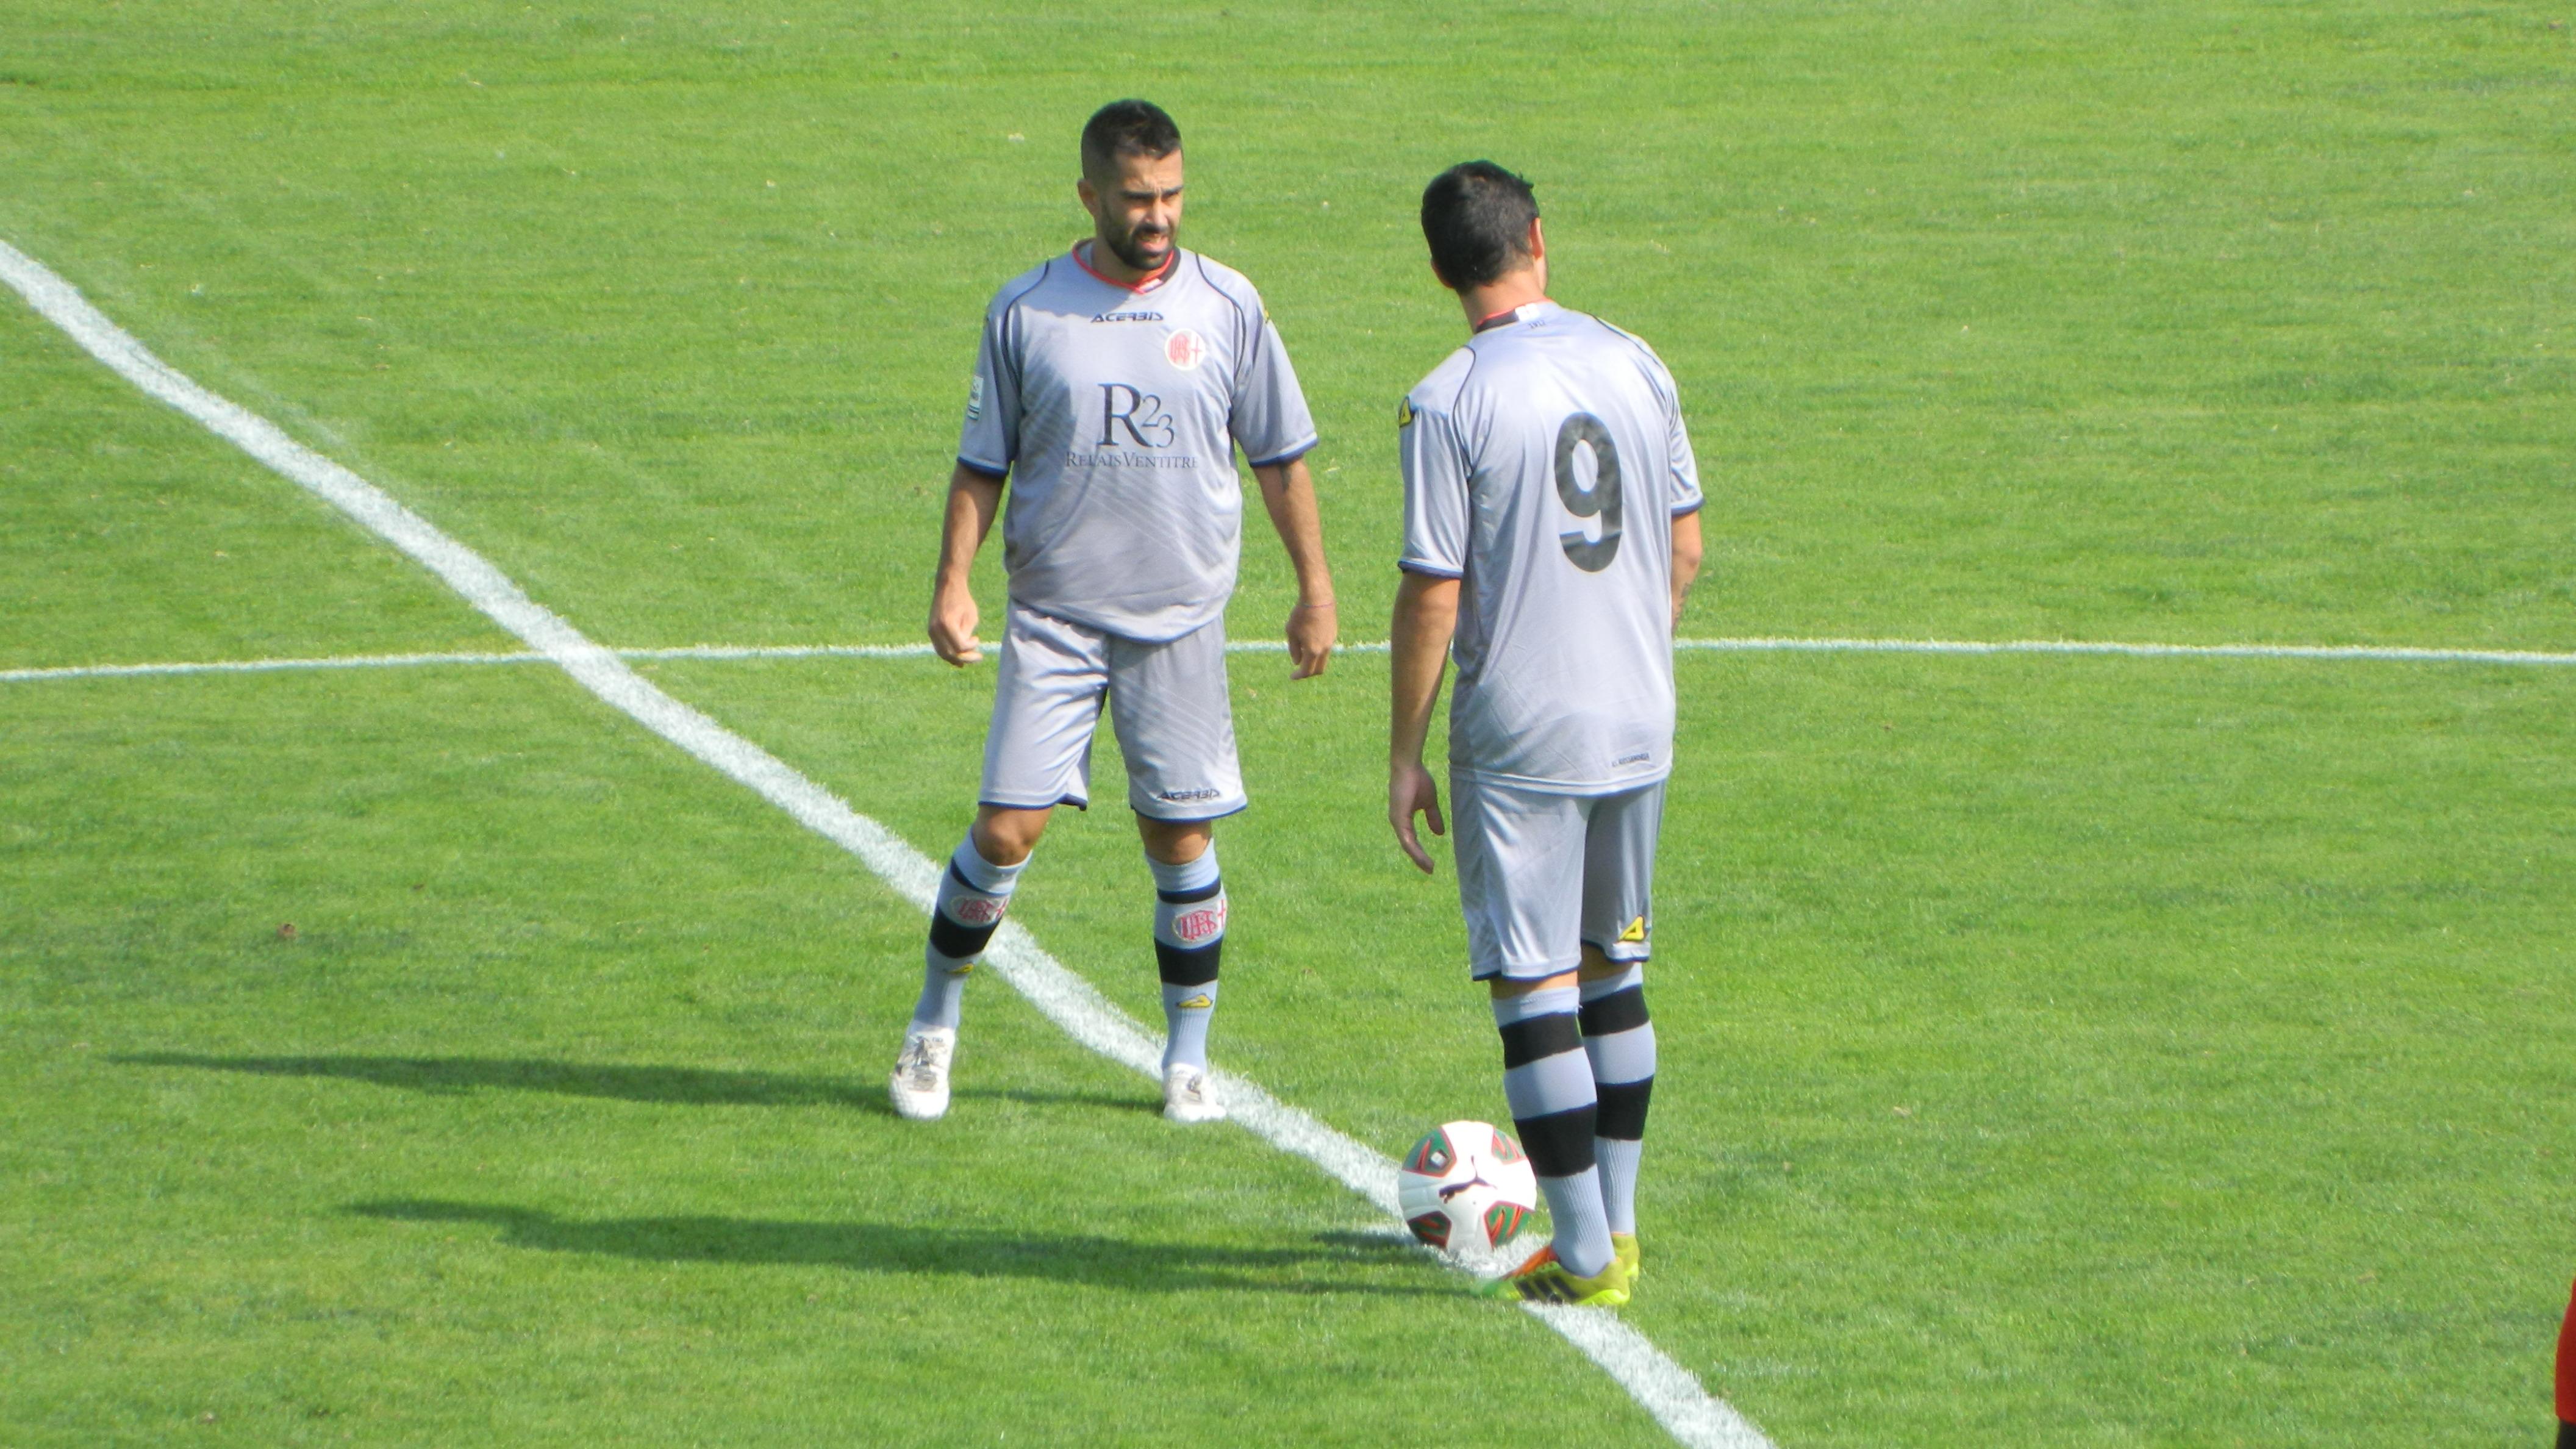 Alessandria-Mantova 30 agosto 2014 (7)